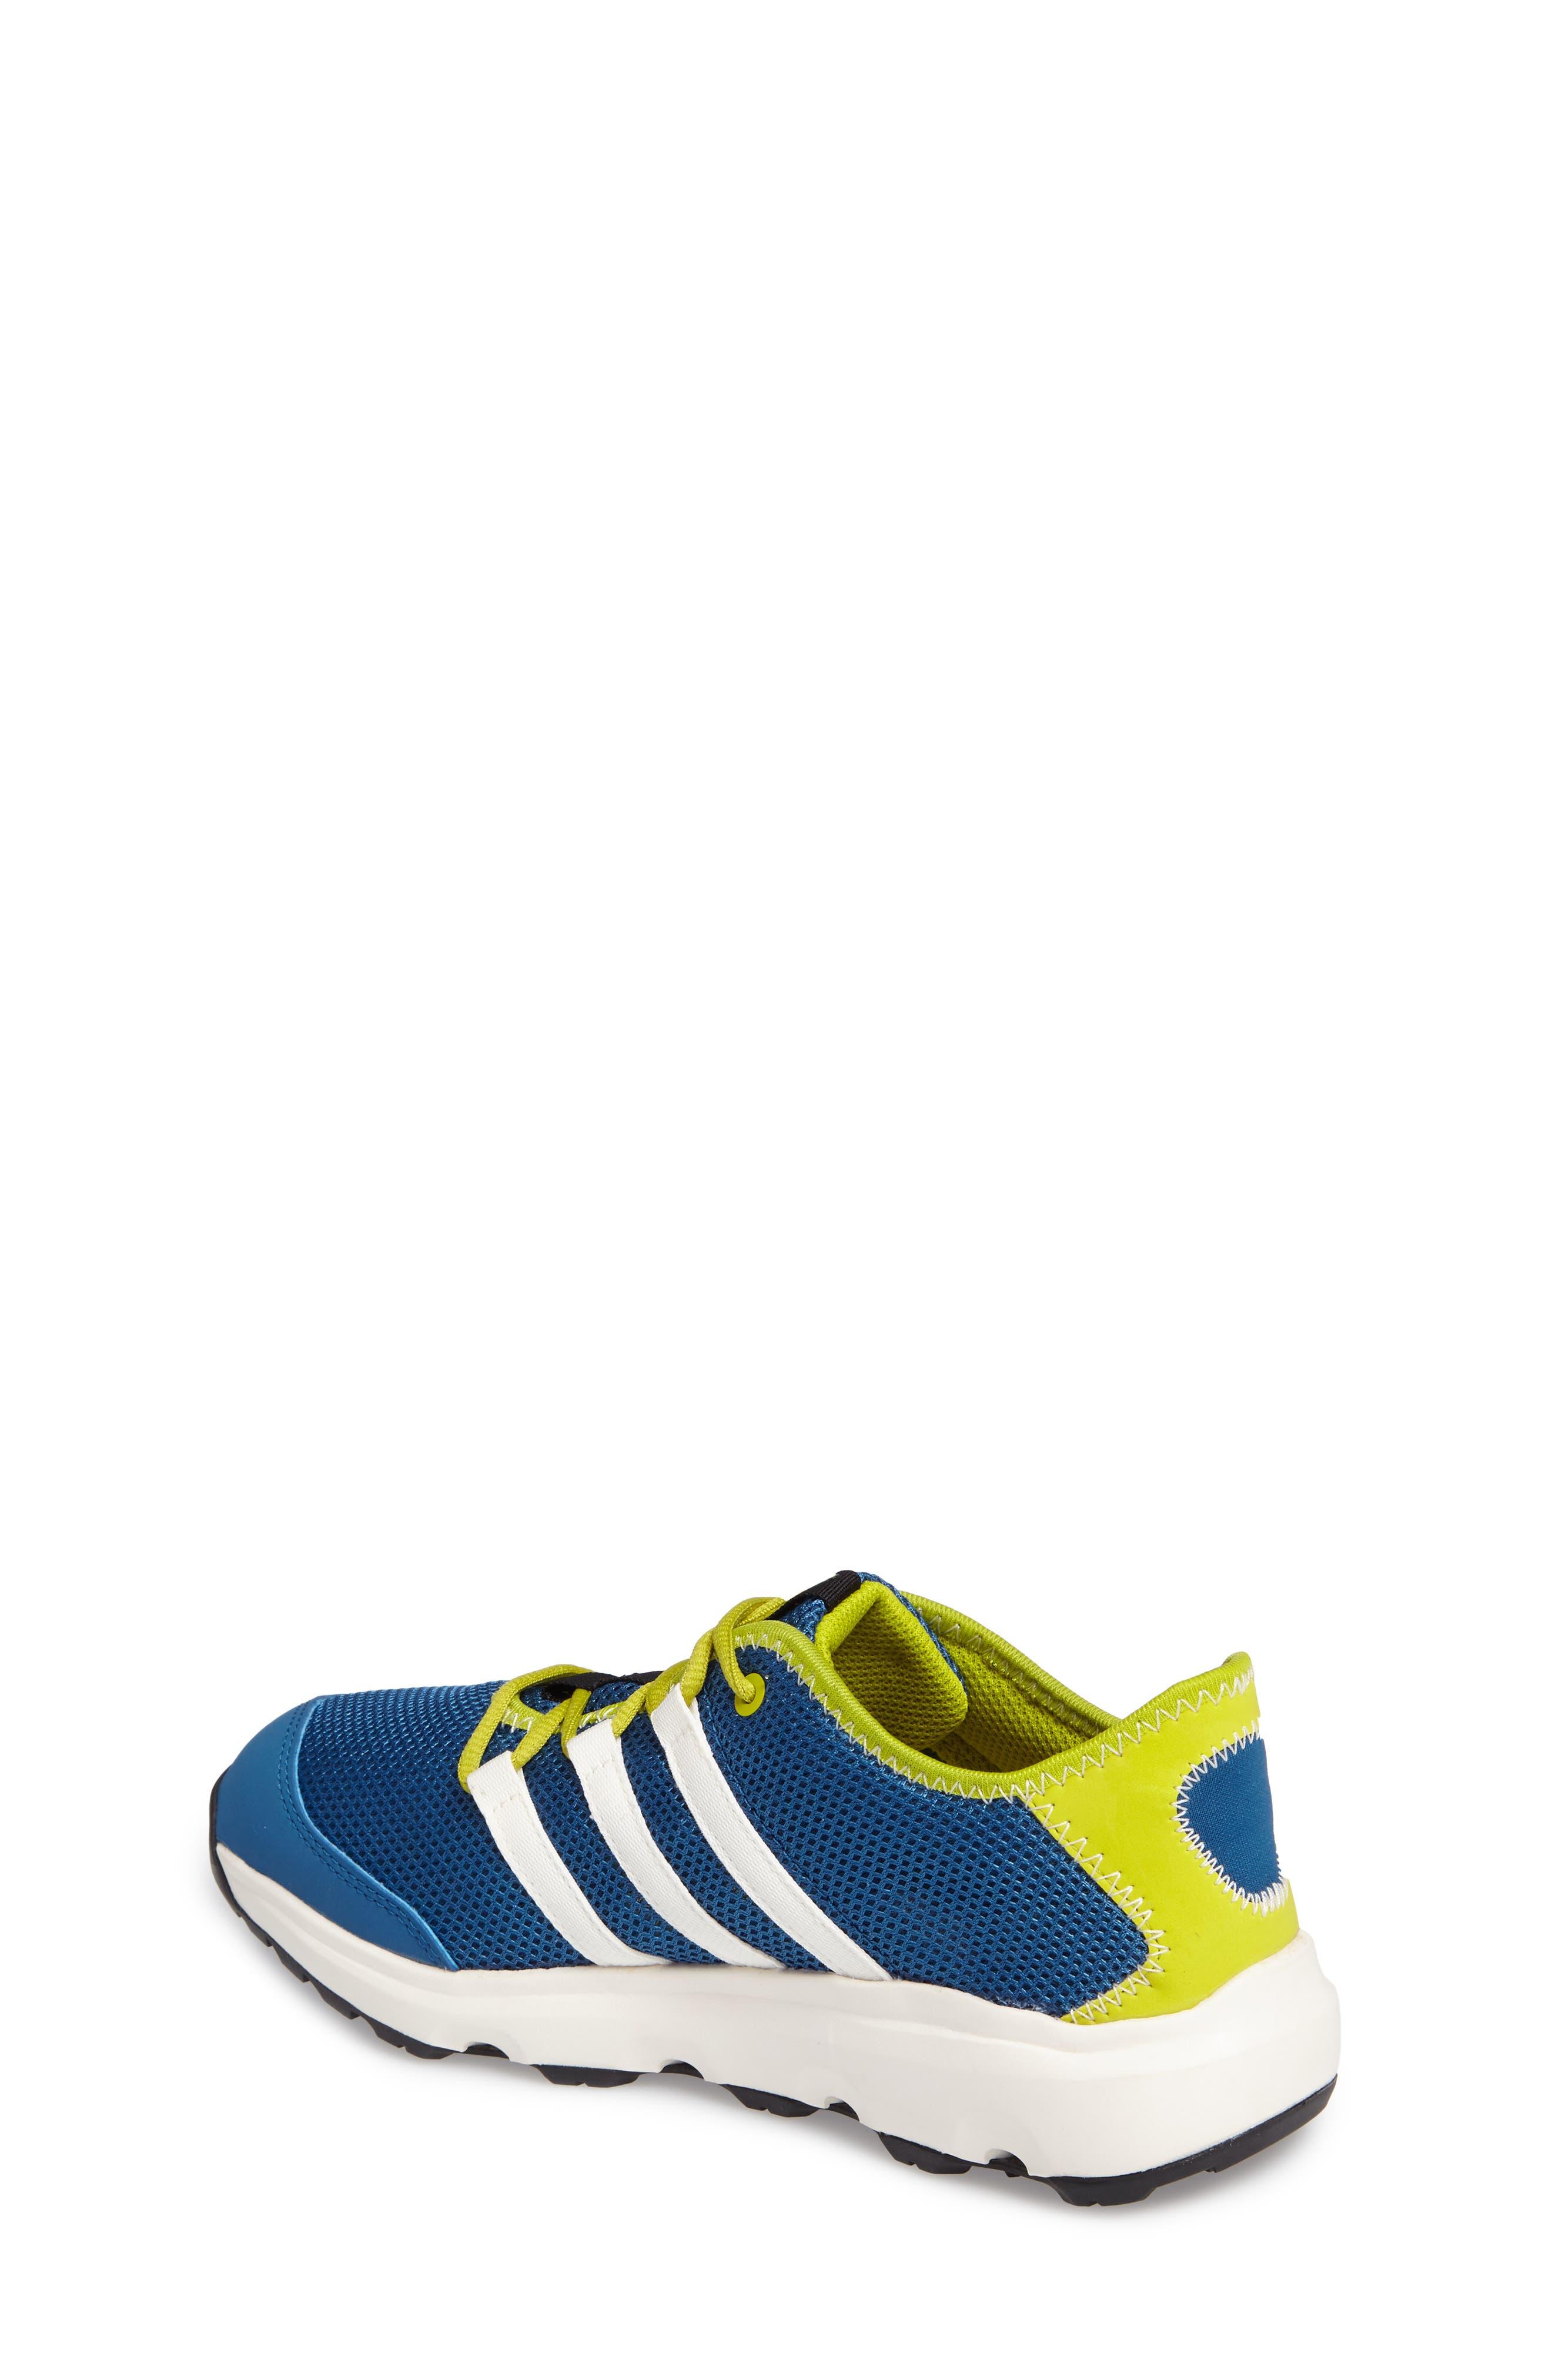 Terrex Climacool<sup>®</sup> Voyager Sneaker,                             Alternate thumbnail 2, color,                             Core Blue/ Chalk White/ Lime